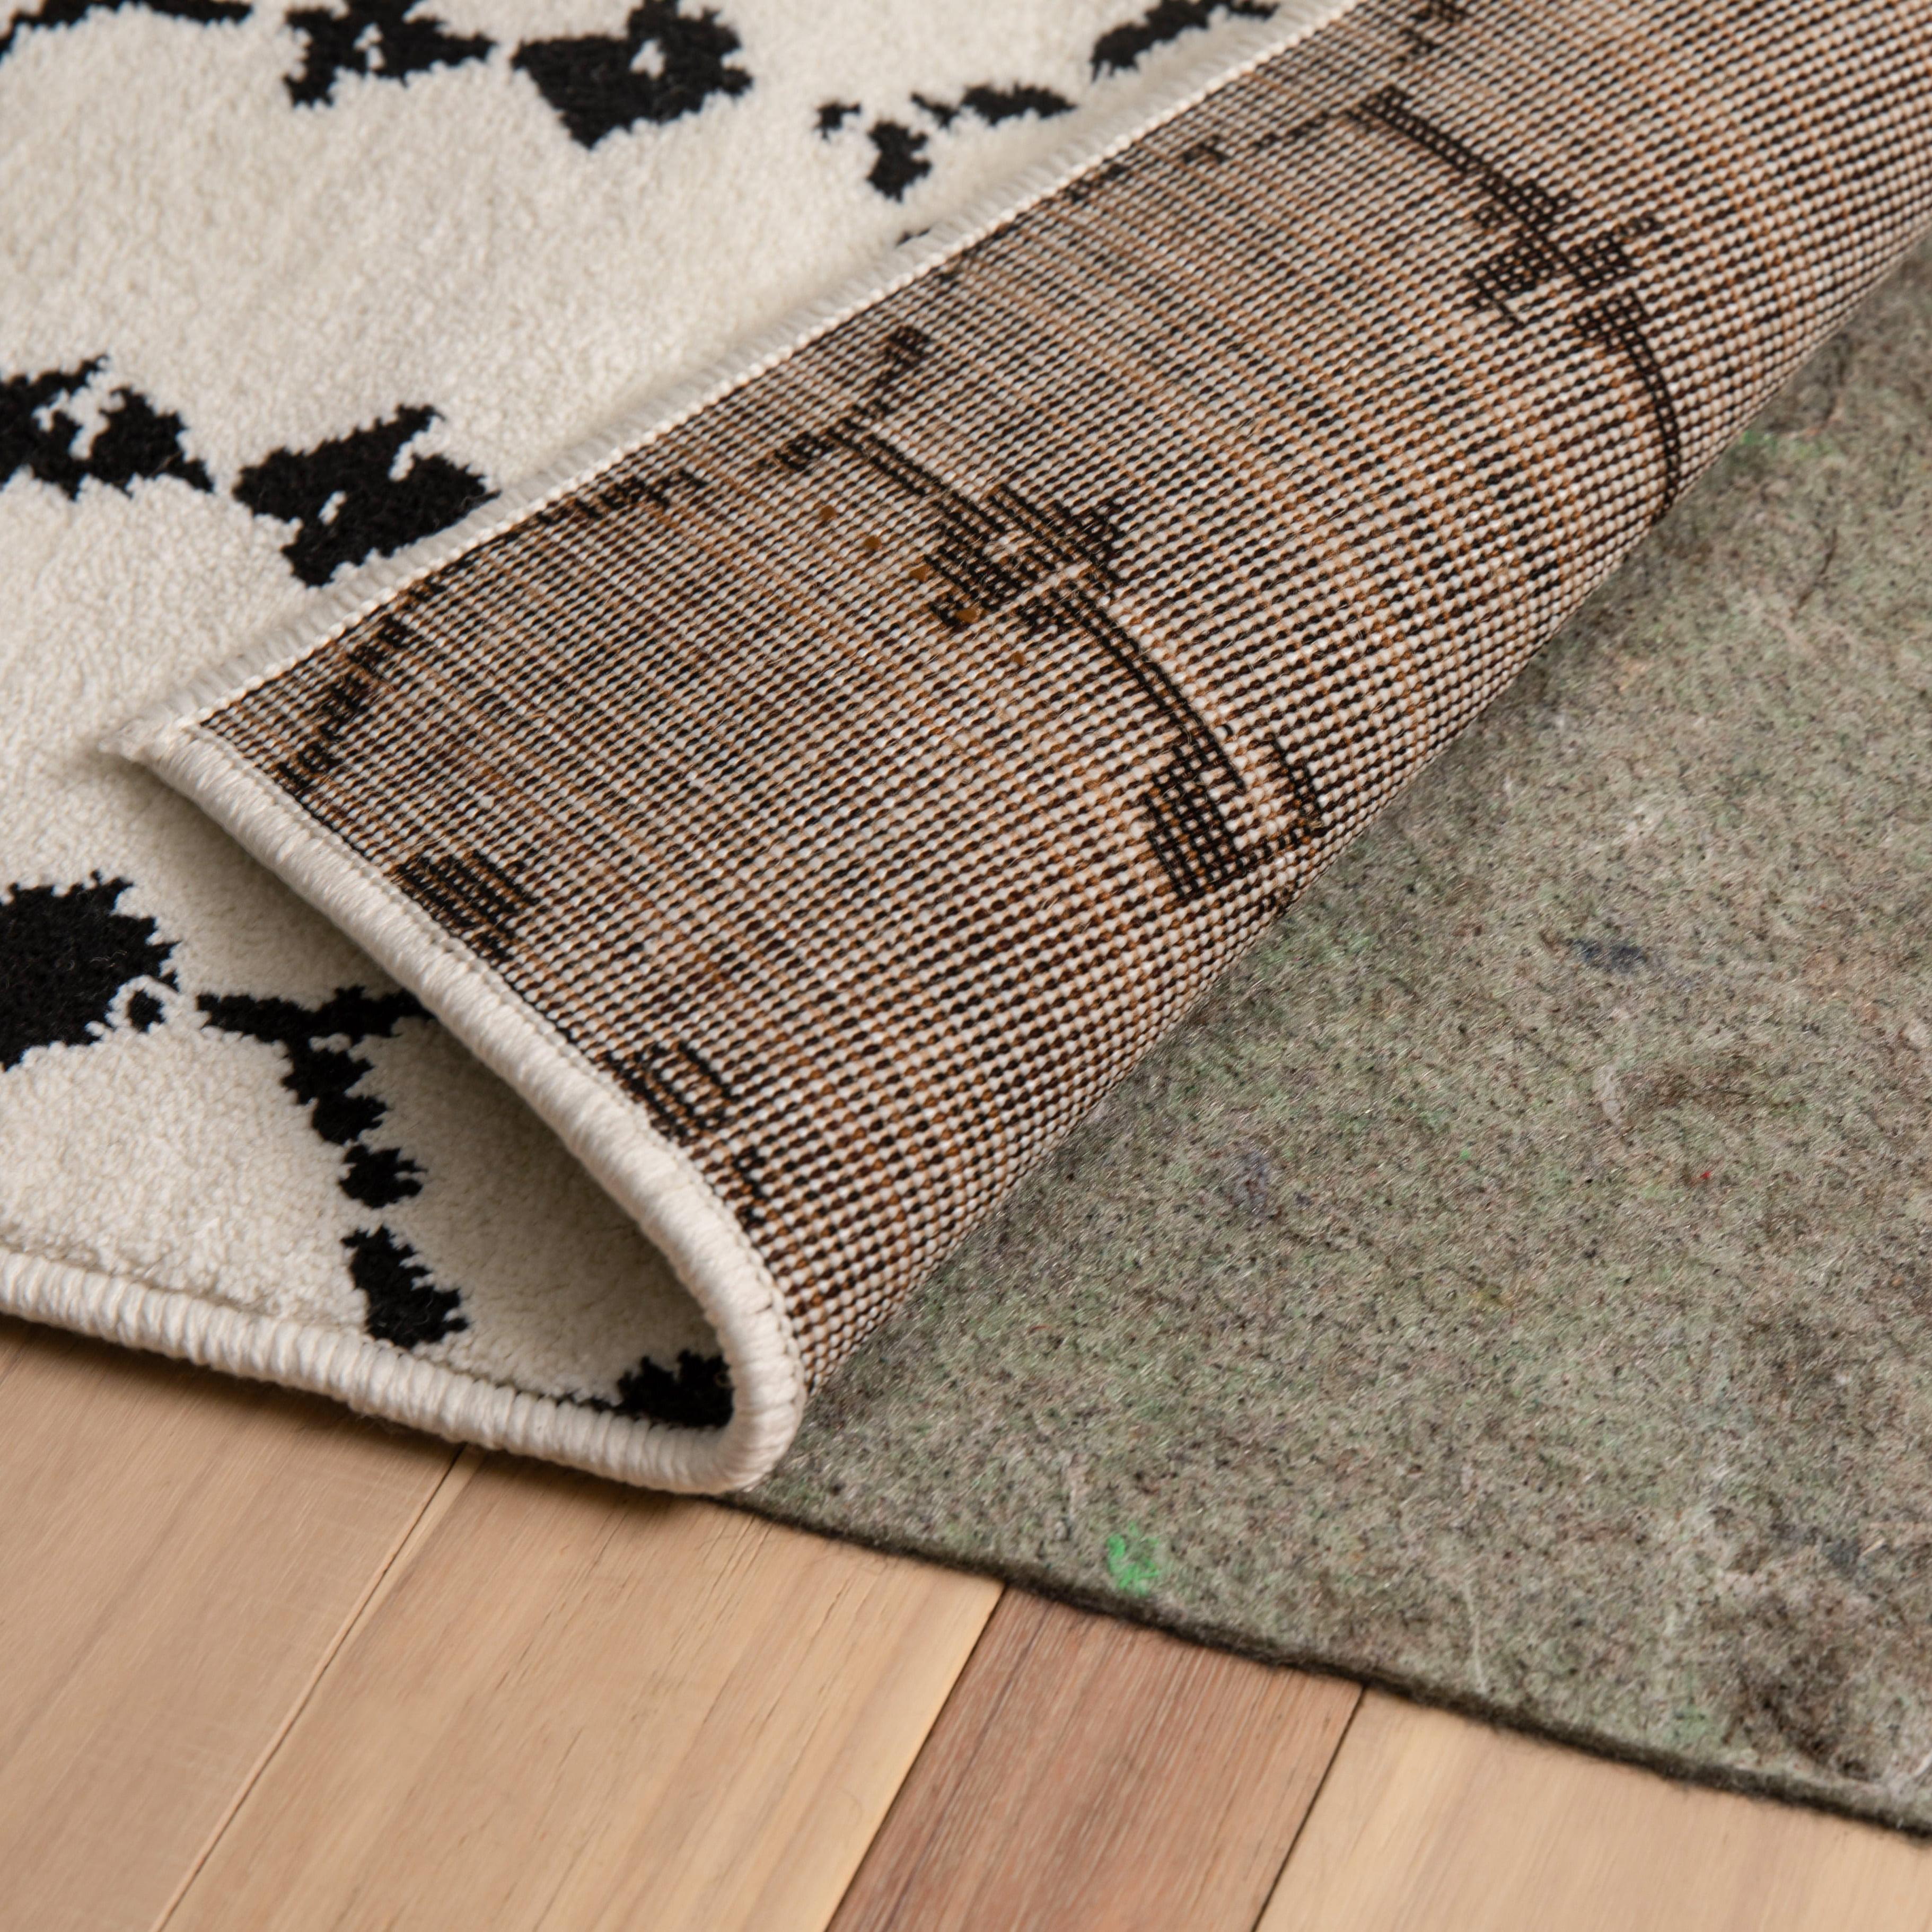 Non Slip Cushion Rug Pad, Stop Rug From Slipping On Laminate Flooring